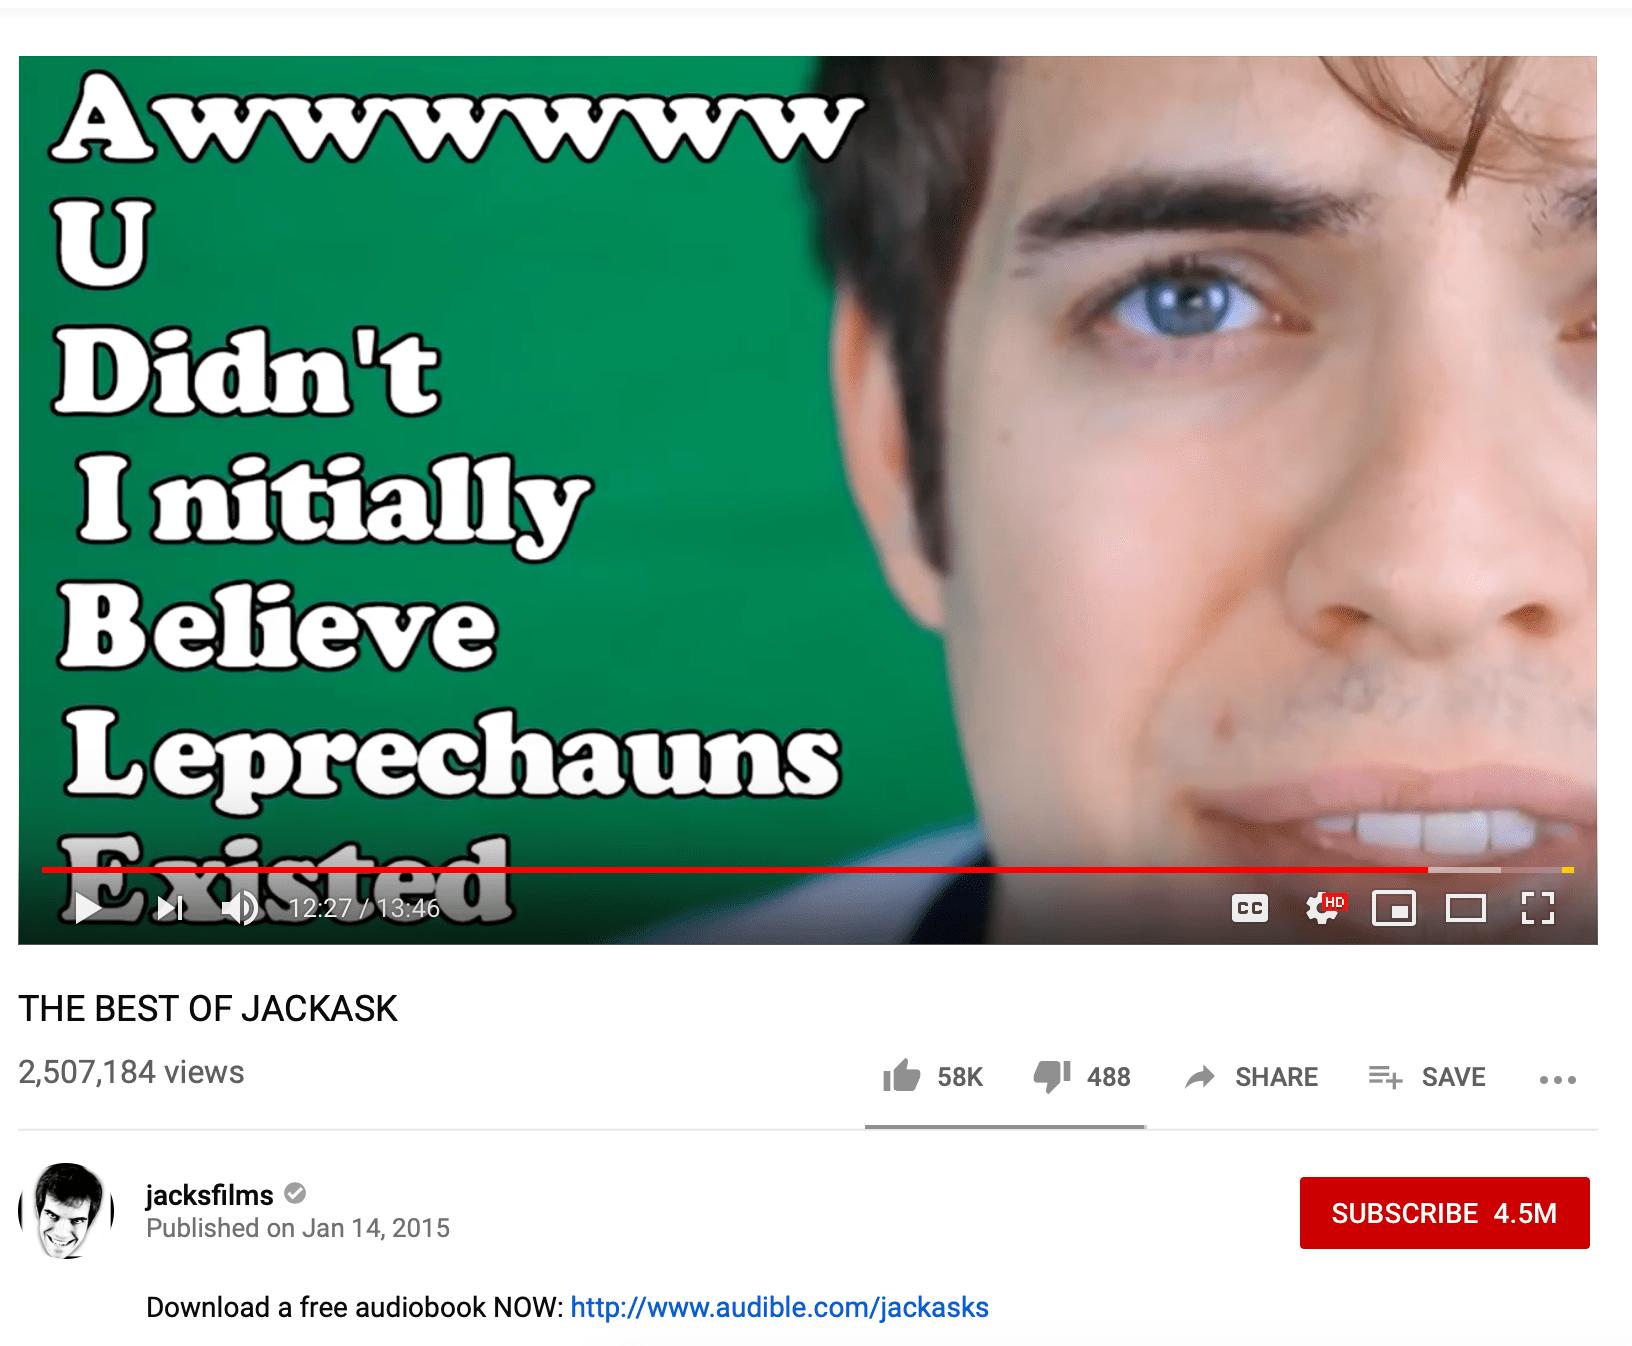 Screenshot of Youtube influencer Jacksfilms